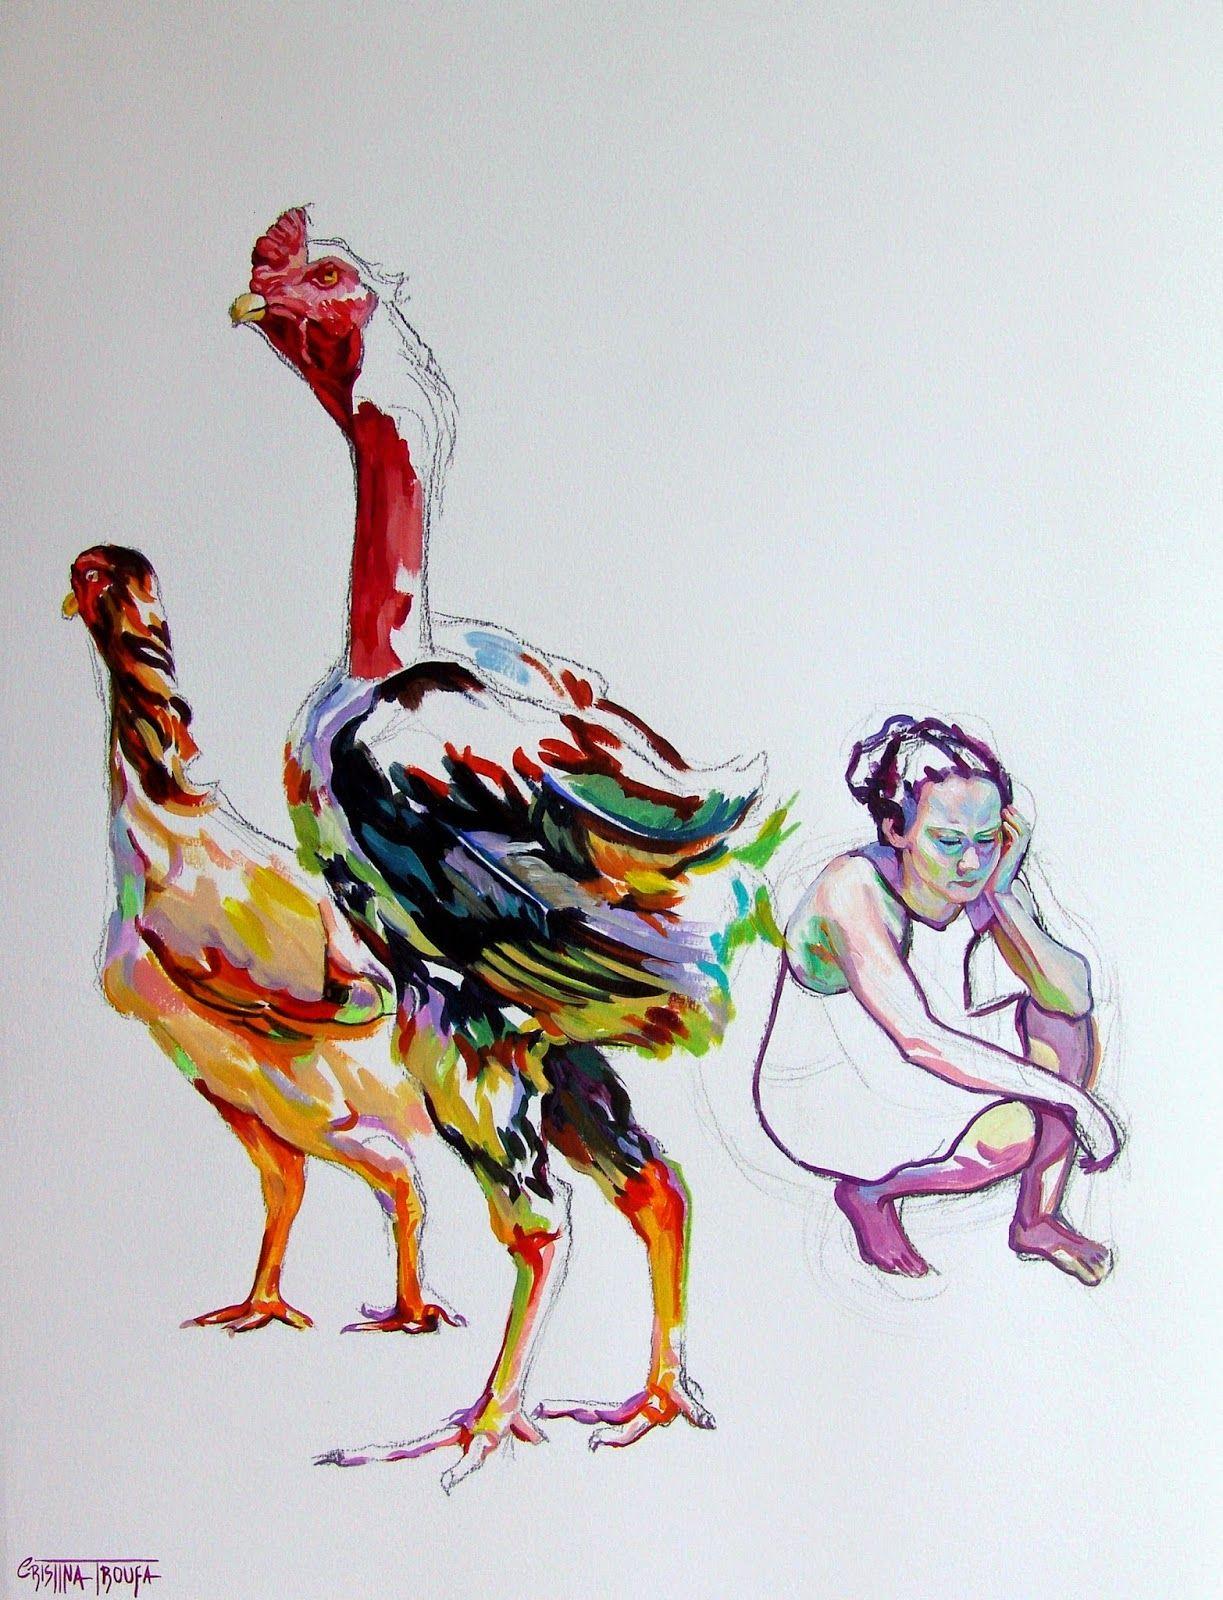 Cristina Troufa - Contemporary Artist - Figurative Painting - Galo #2 - 2014